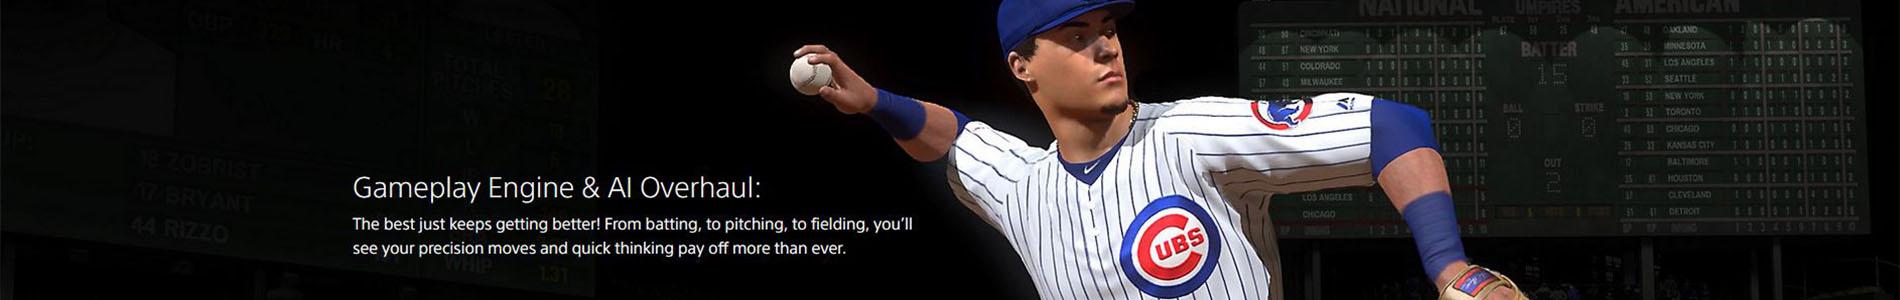 Sony Playstation Mlb Theshow LP MLB 01